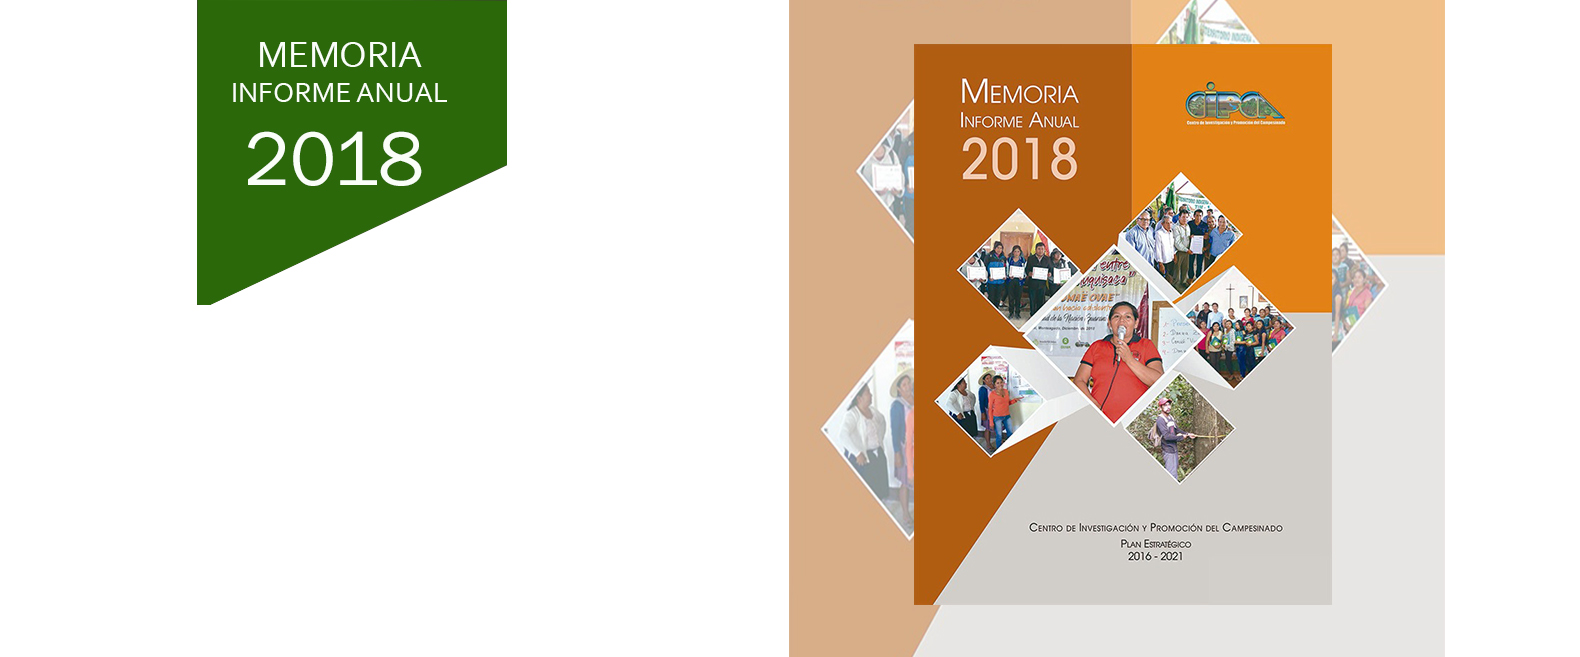 Memoria Informe Anual - CIPCA 2018